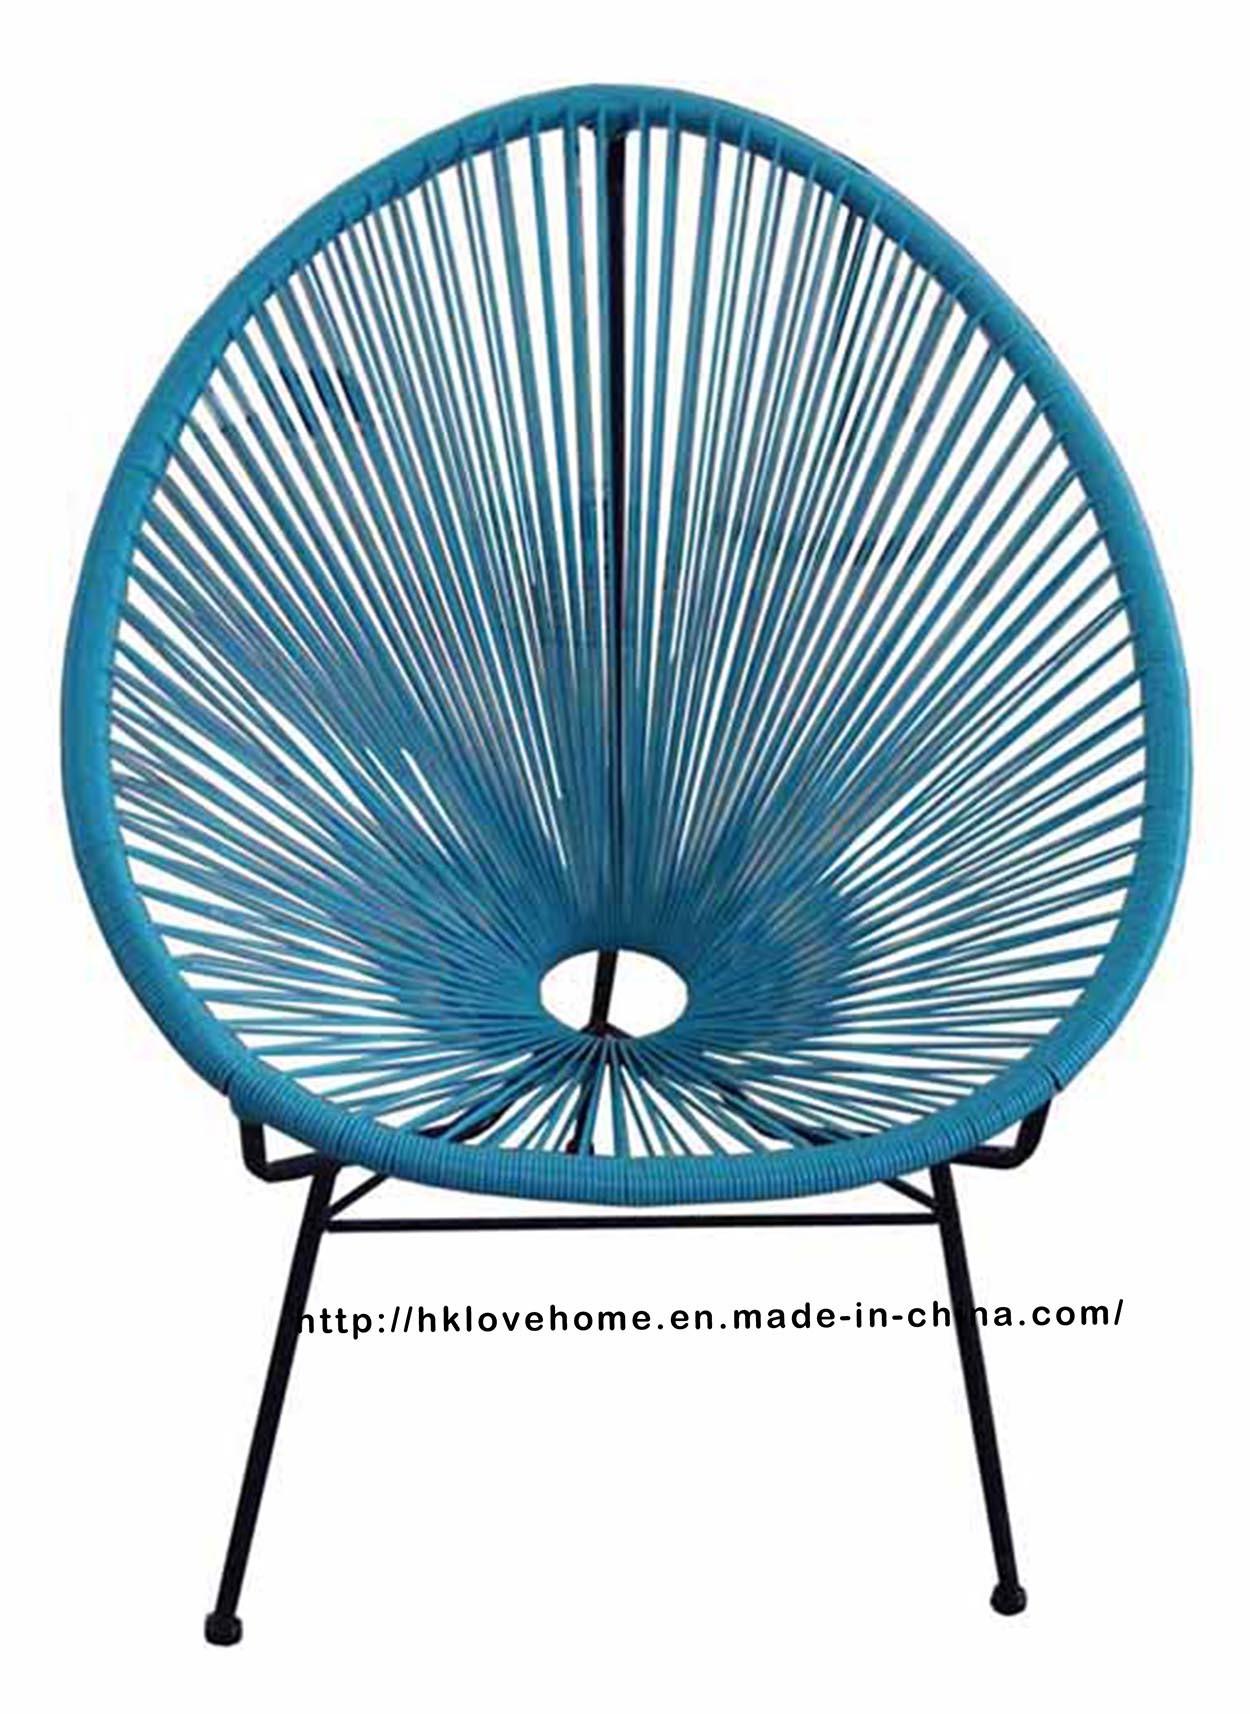 Awe Inspiring Hot Item Metal Rattan Outdoor Restaurant Furniture Leisure Acapulco Garden Chair Camellatalisay Diy Chair Ideas Camellatalisaycom